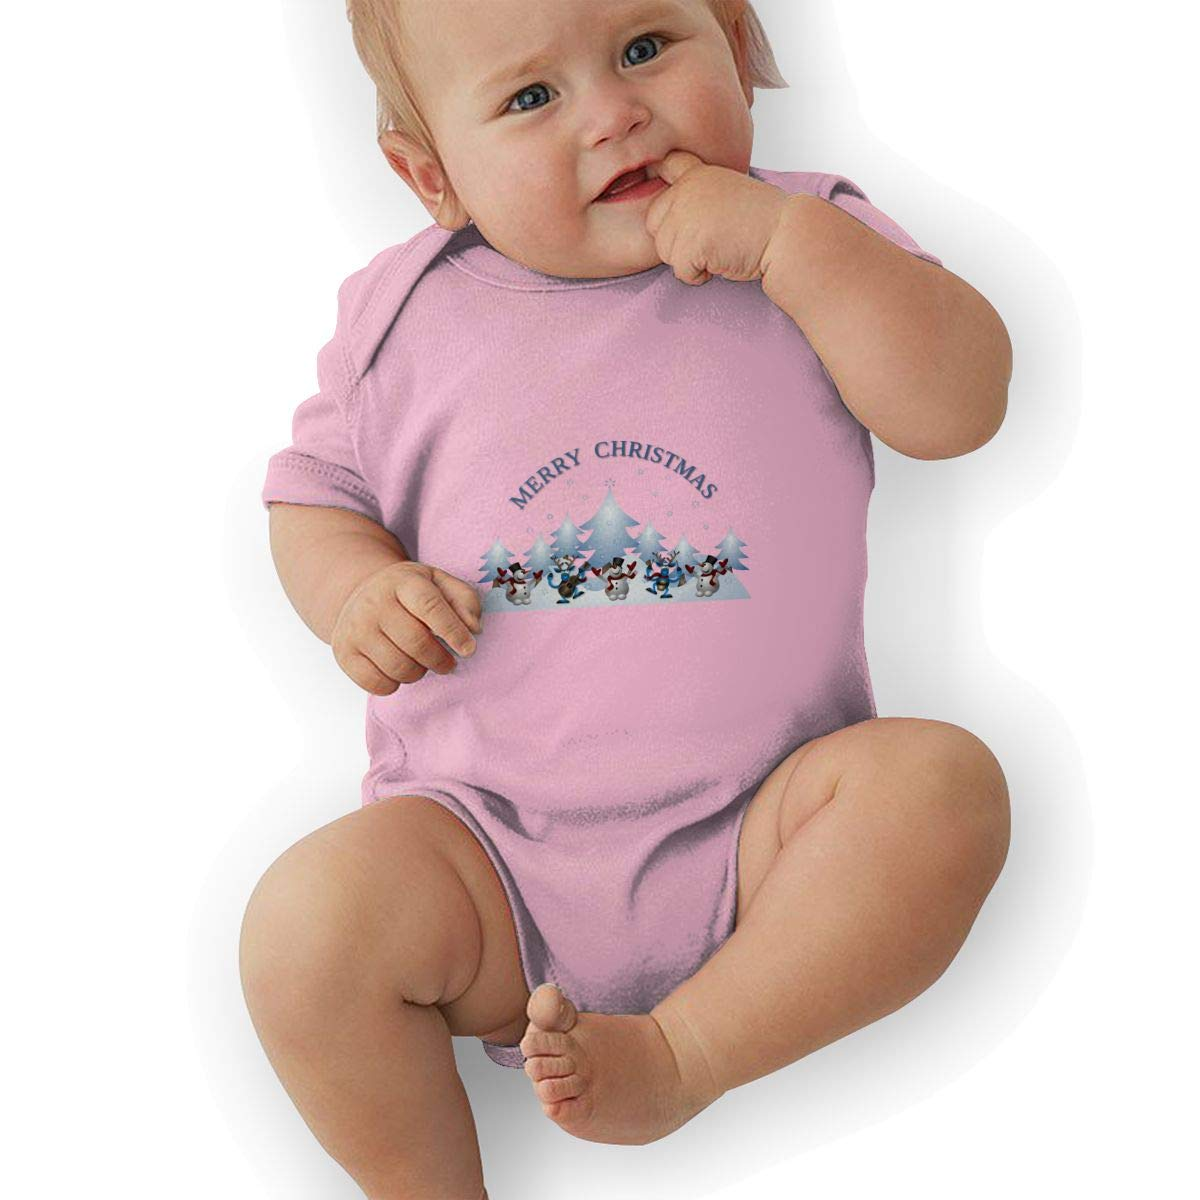 Toddler Baby Boys Bodysuit Short-Sleeve Onesie Merry Christmas Print Outfit Autumn Pajamas